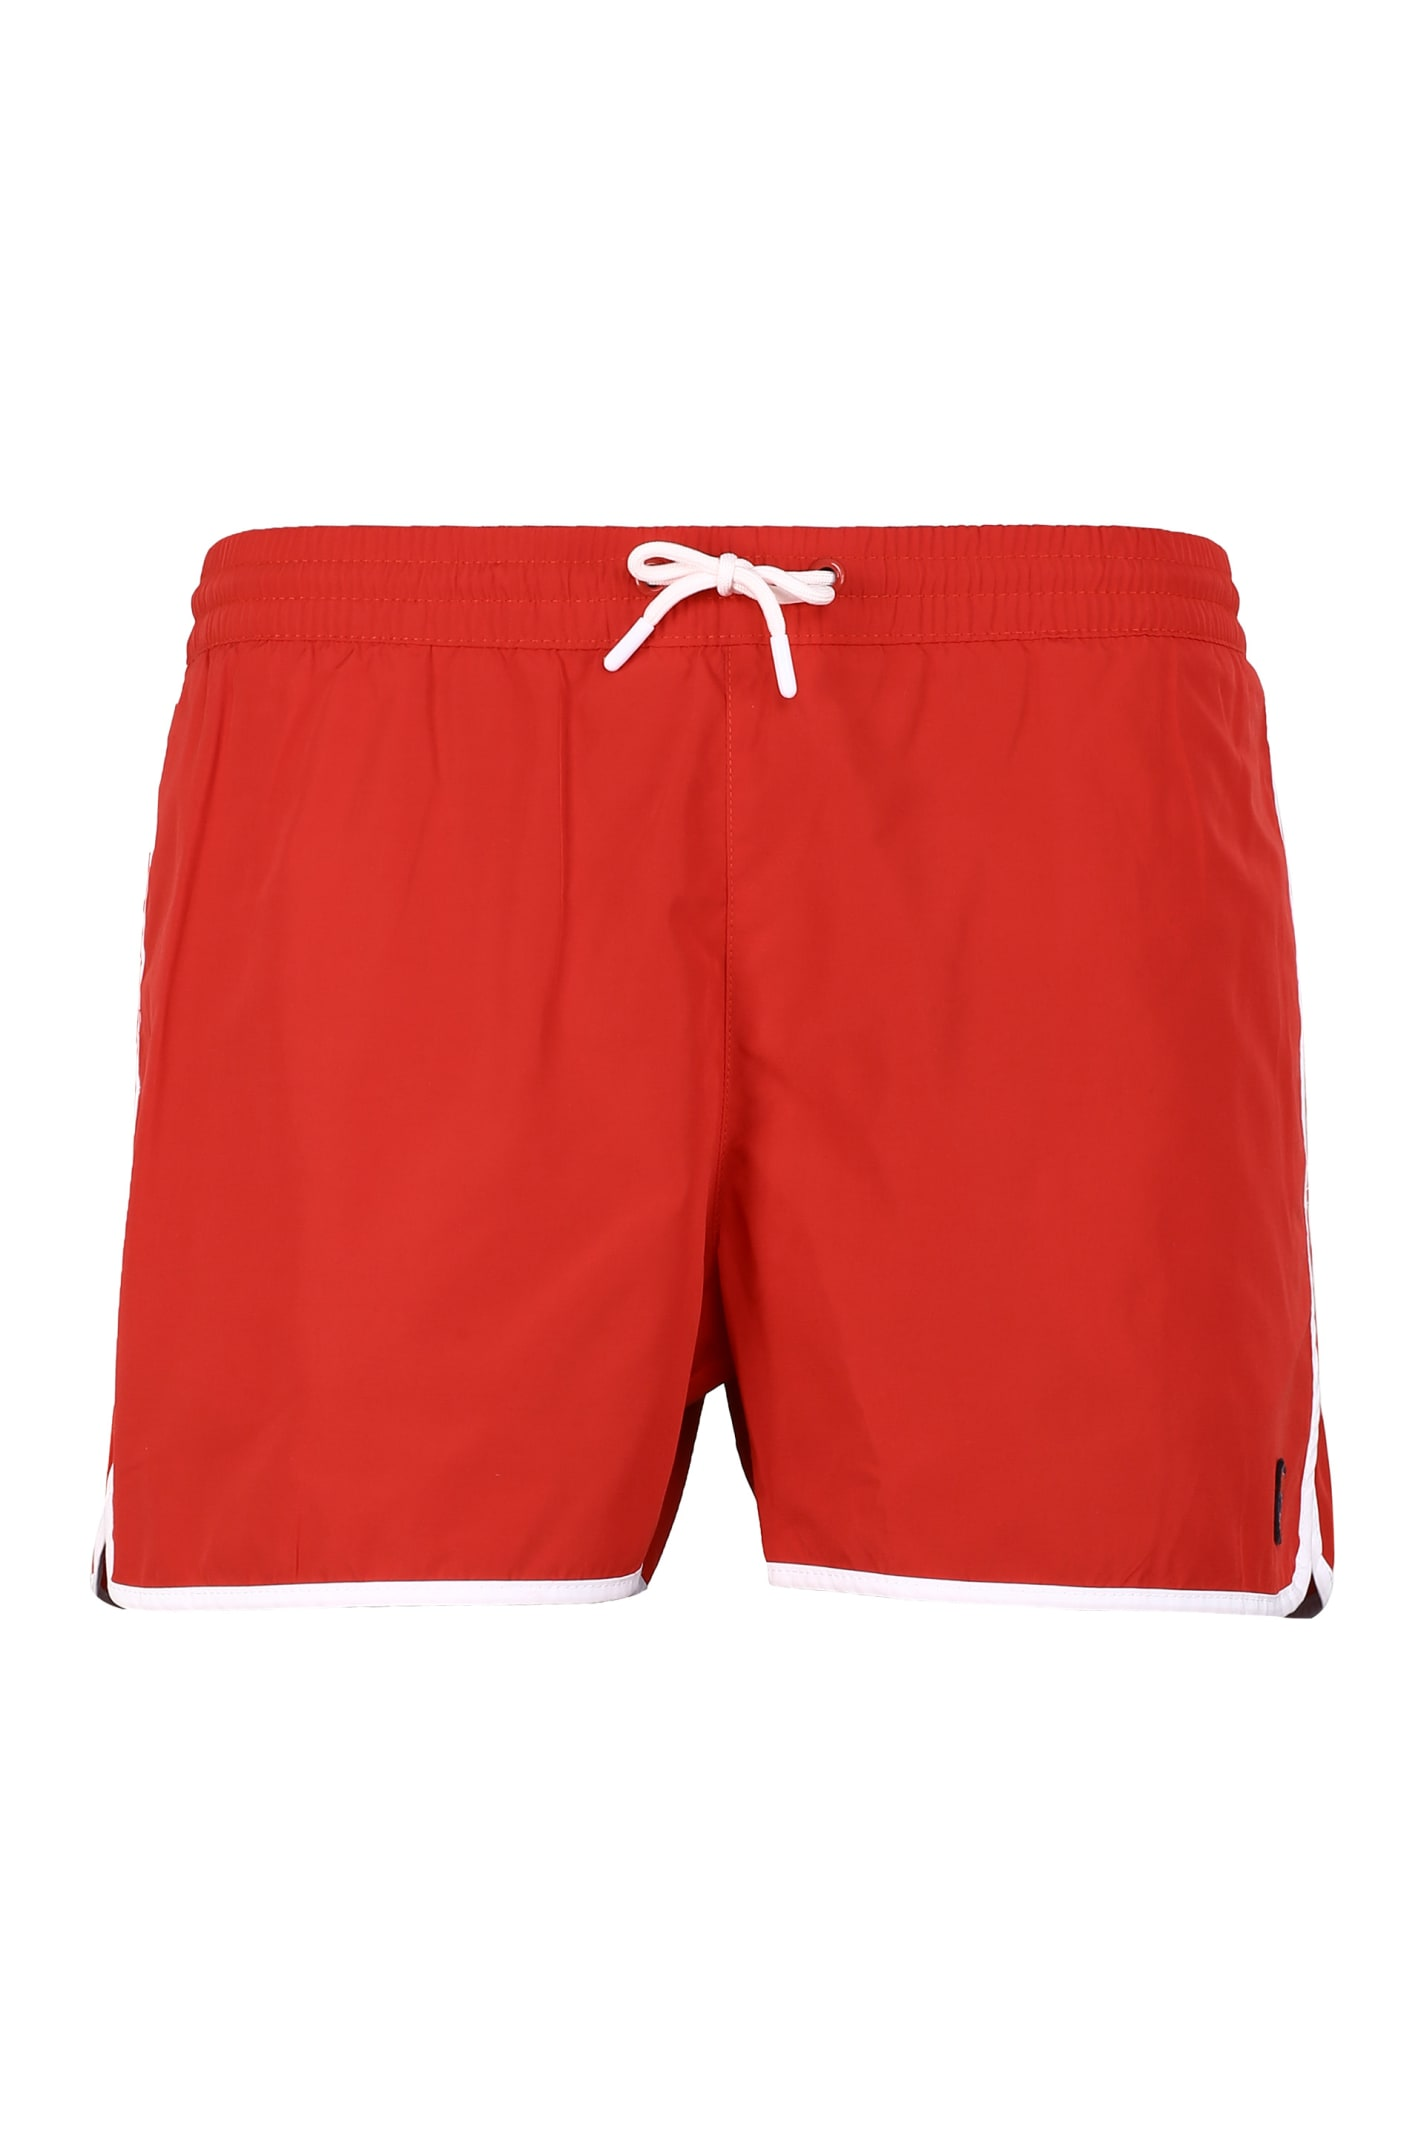 High Quality Fila Swim Shorts - Top